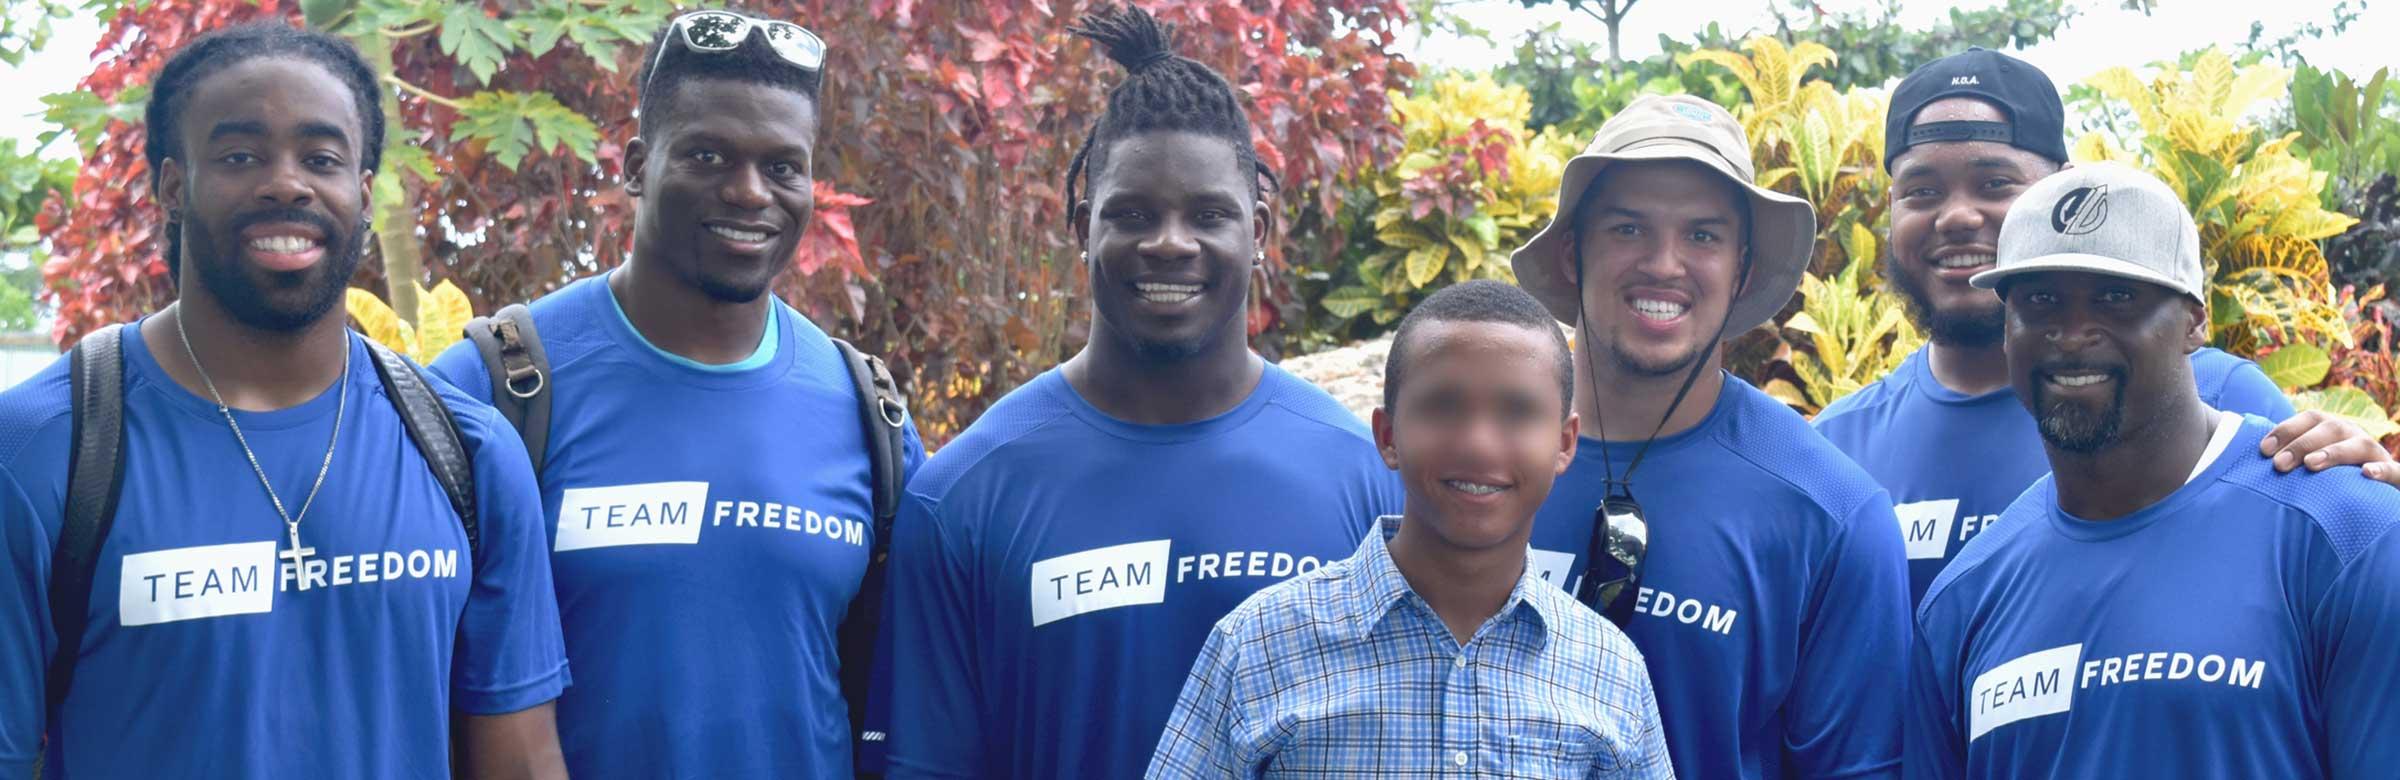 In 2017, six NFL players traveled to Santo Domingo with IJM's Team Freedom initiative.